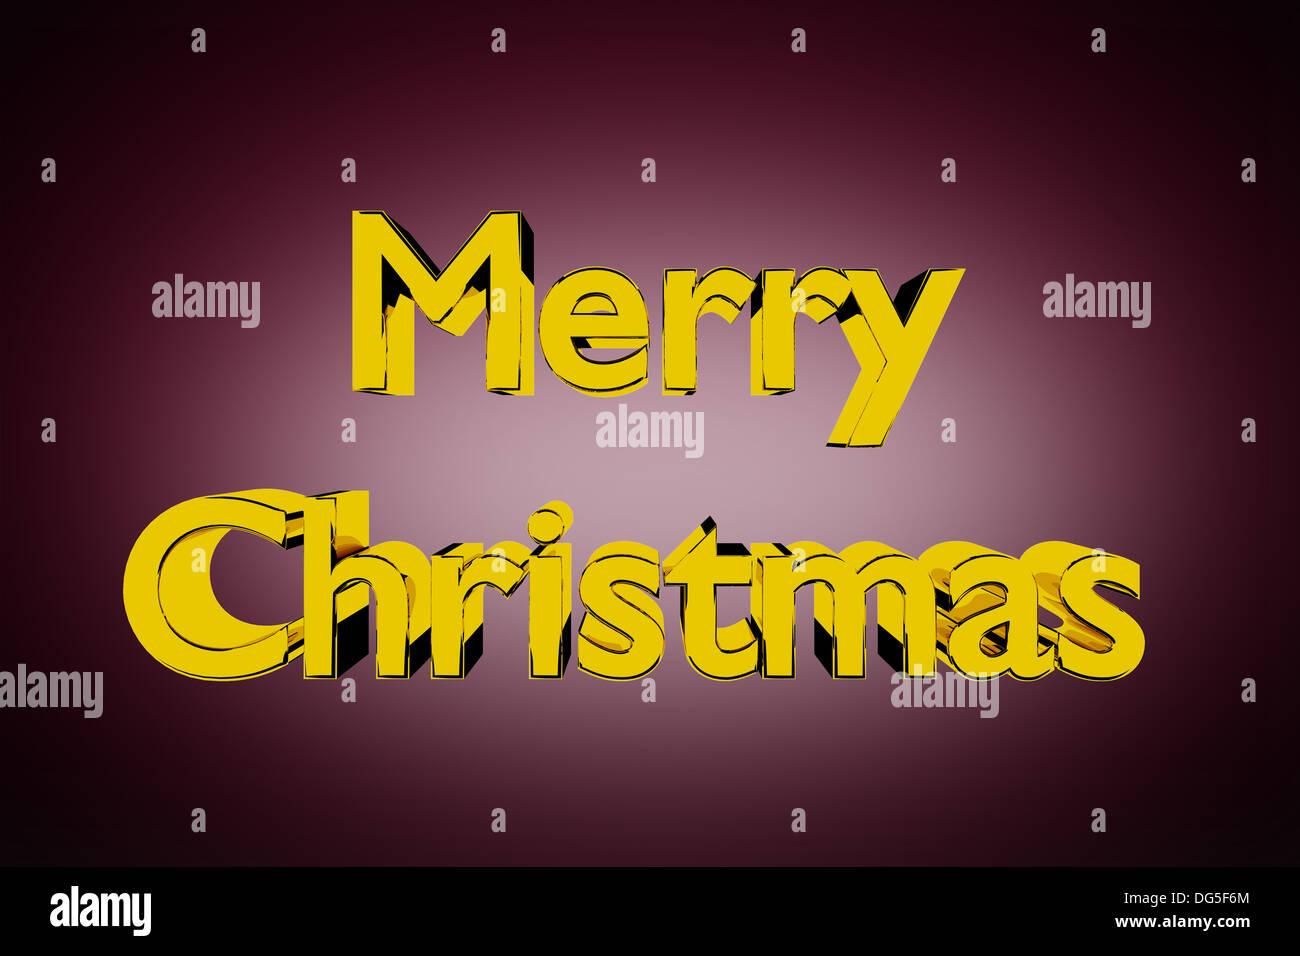 3D Abbildung des goldenen Merry Christmas Schriftzug auf rotem Grund Stockbild